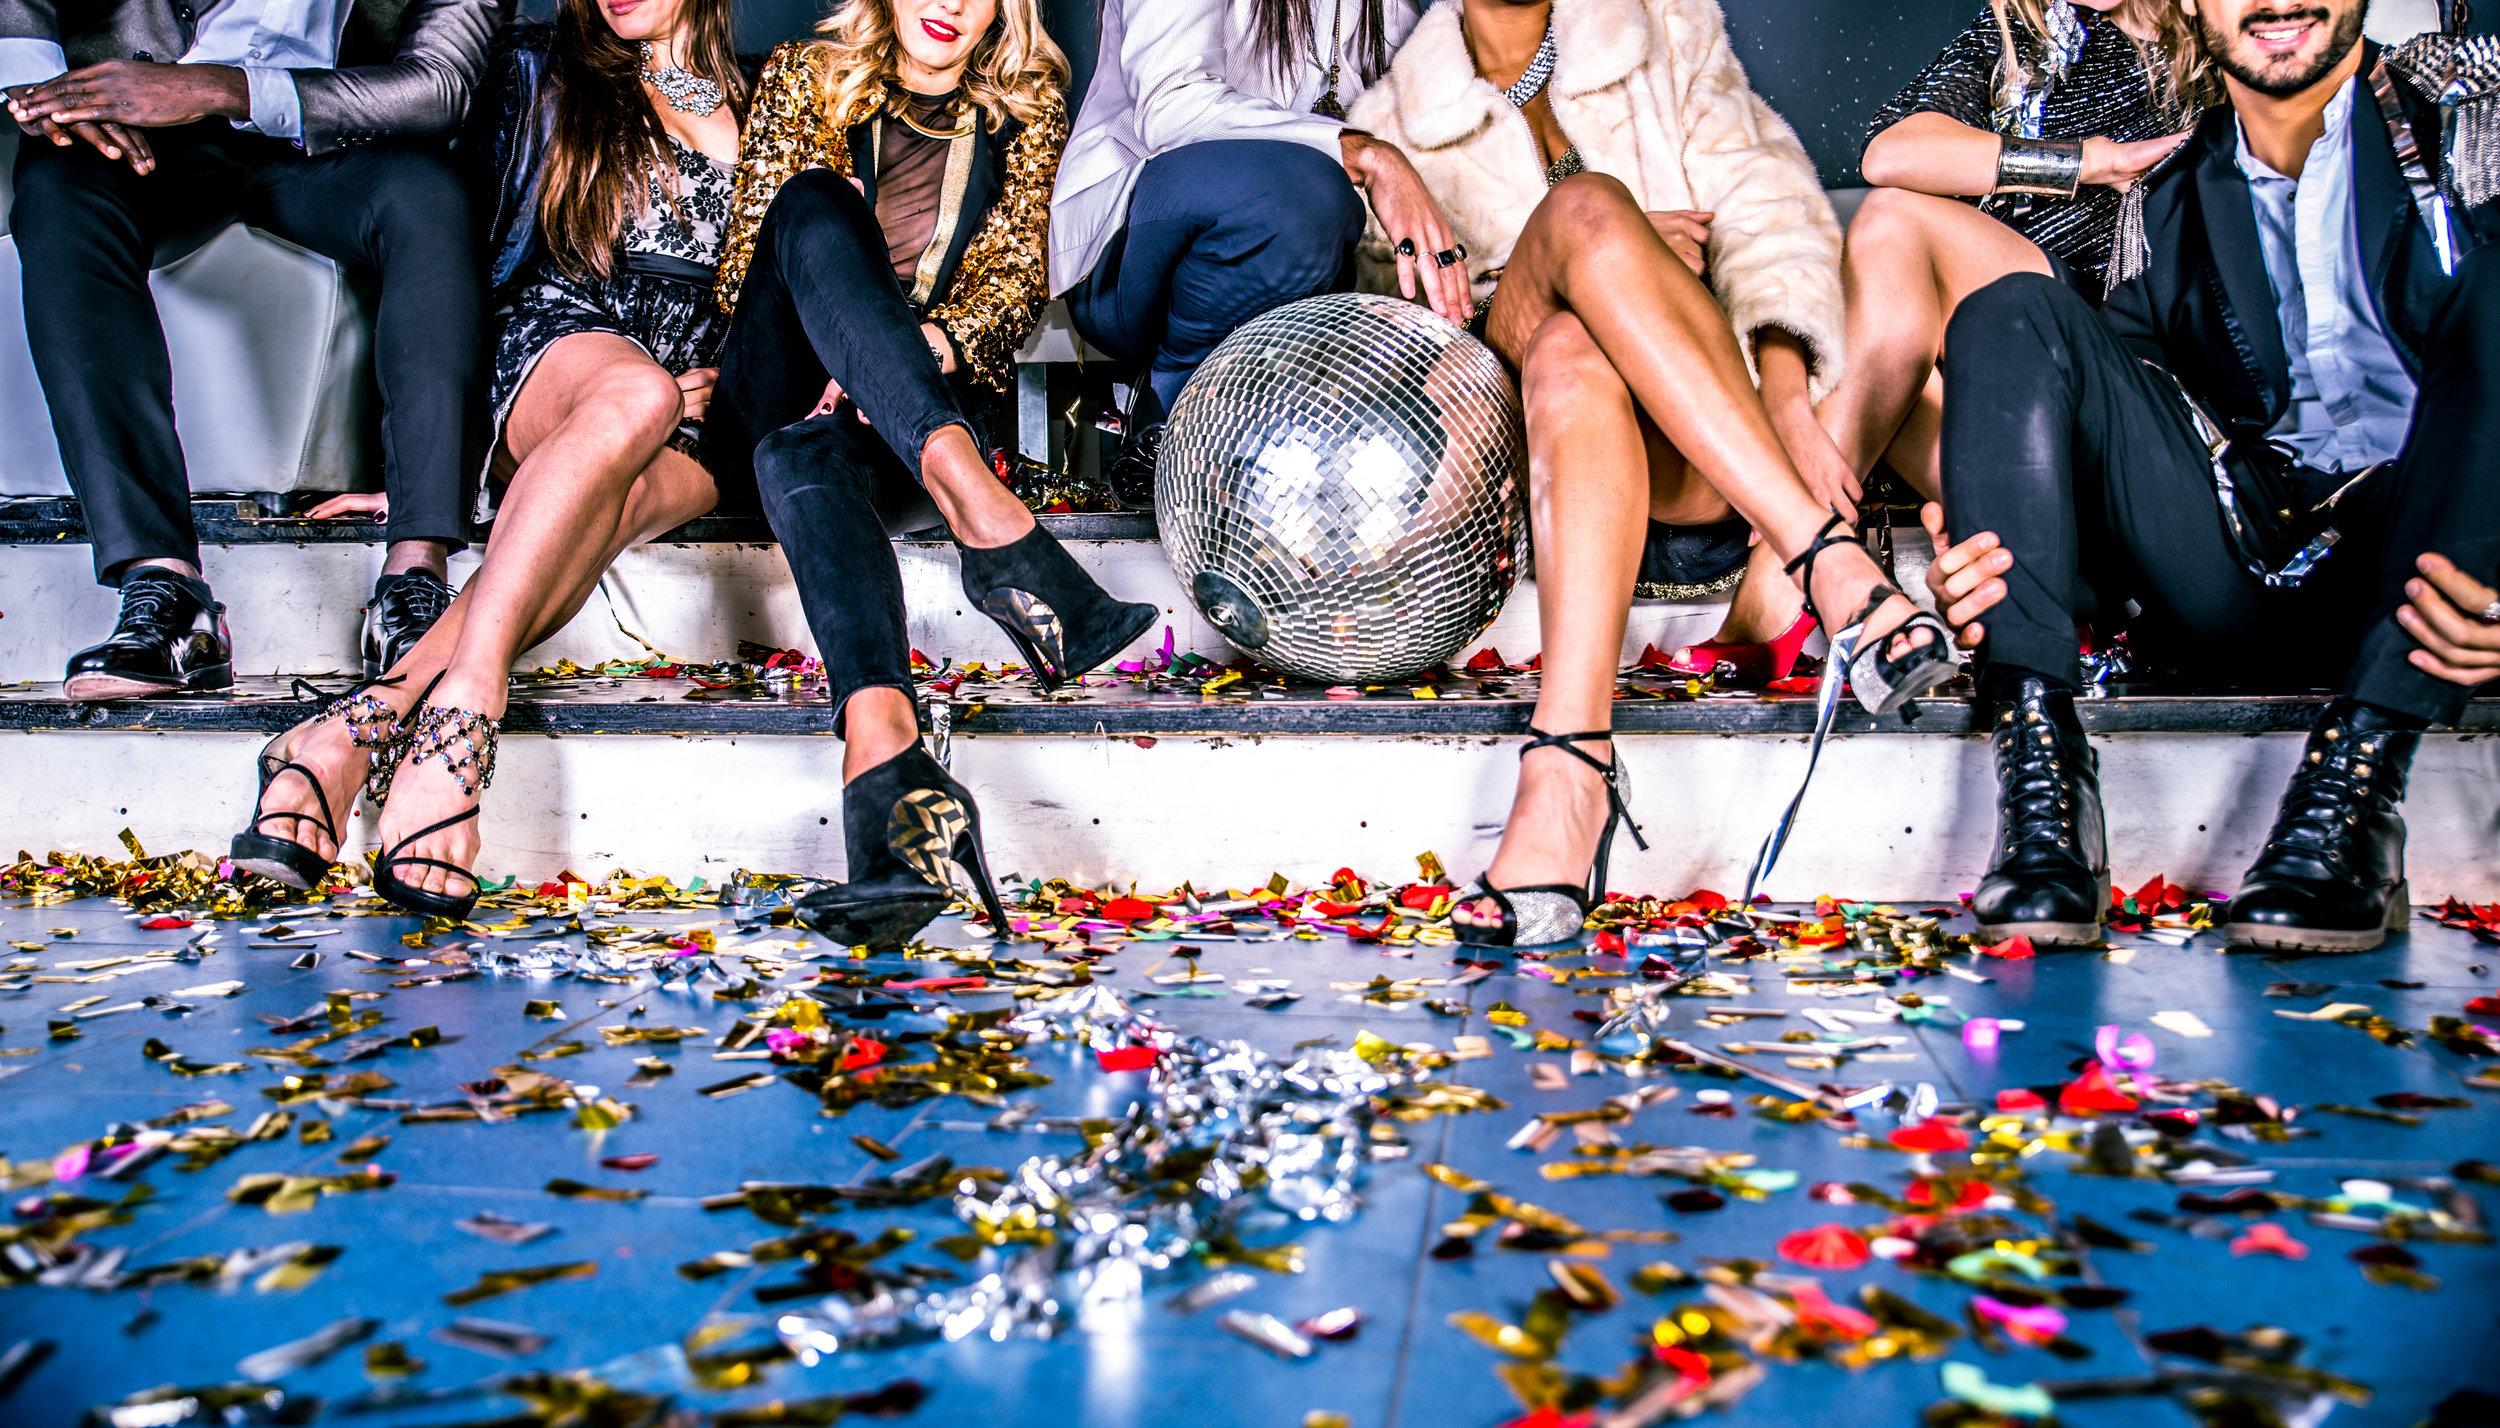 Friends-having-party-in-a-nightclub-655978890_5308x3032.jpeg